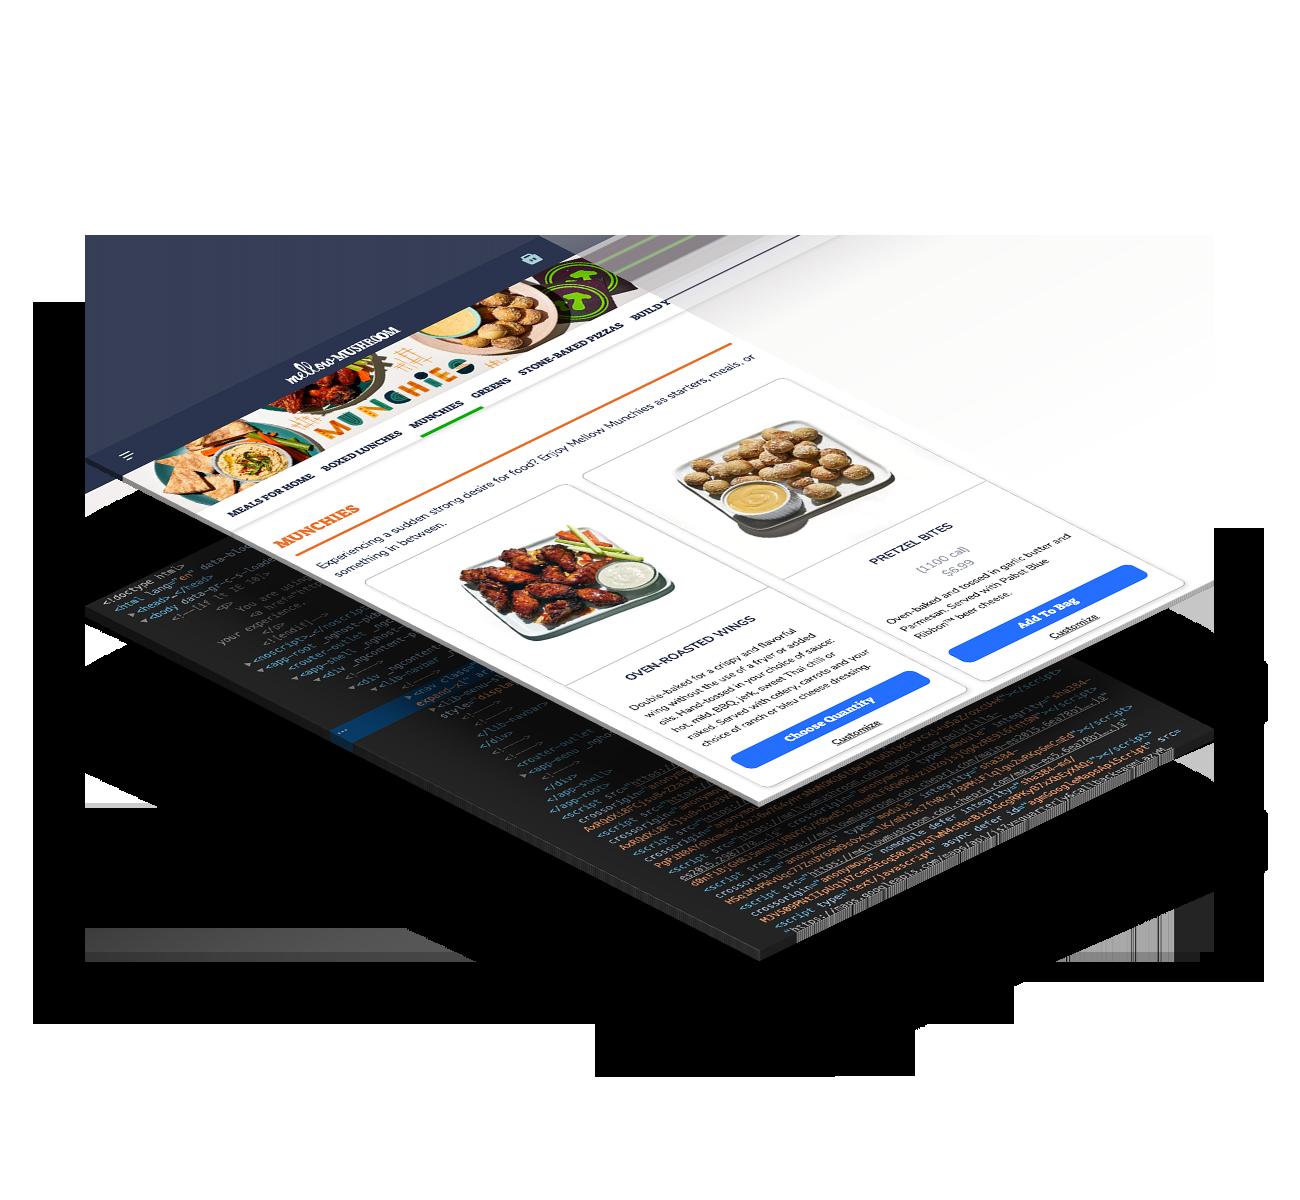 Mellow mushroom restaurant digital menu app